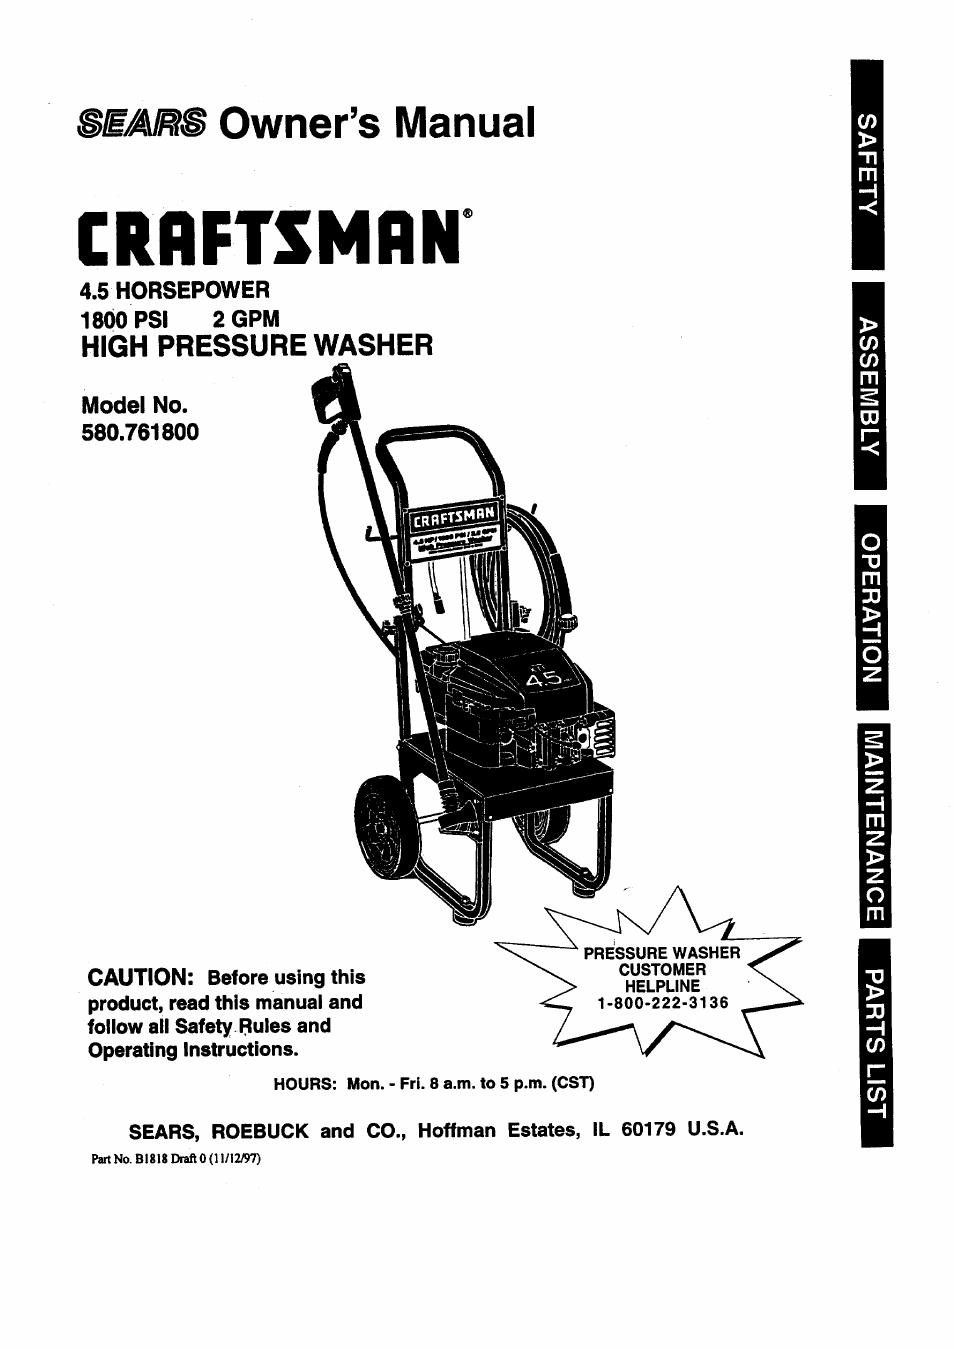 craftsman 580 761800 user manual 28 pages rh manualsdir com craftsman 3100 psi pressure washer owners manual craftsman 3100 psi pressure washer owners manual